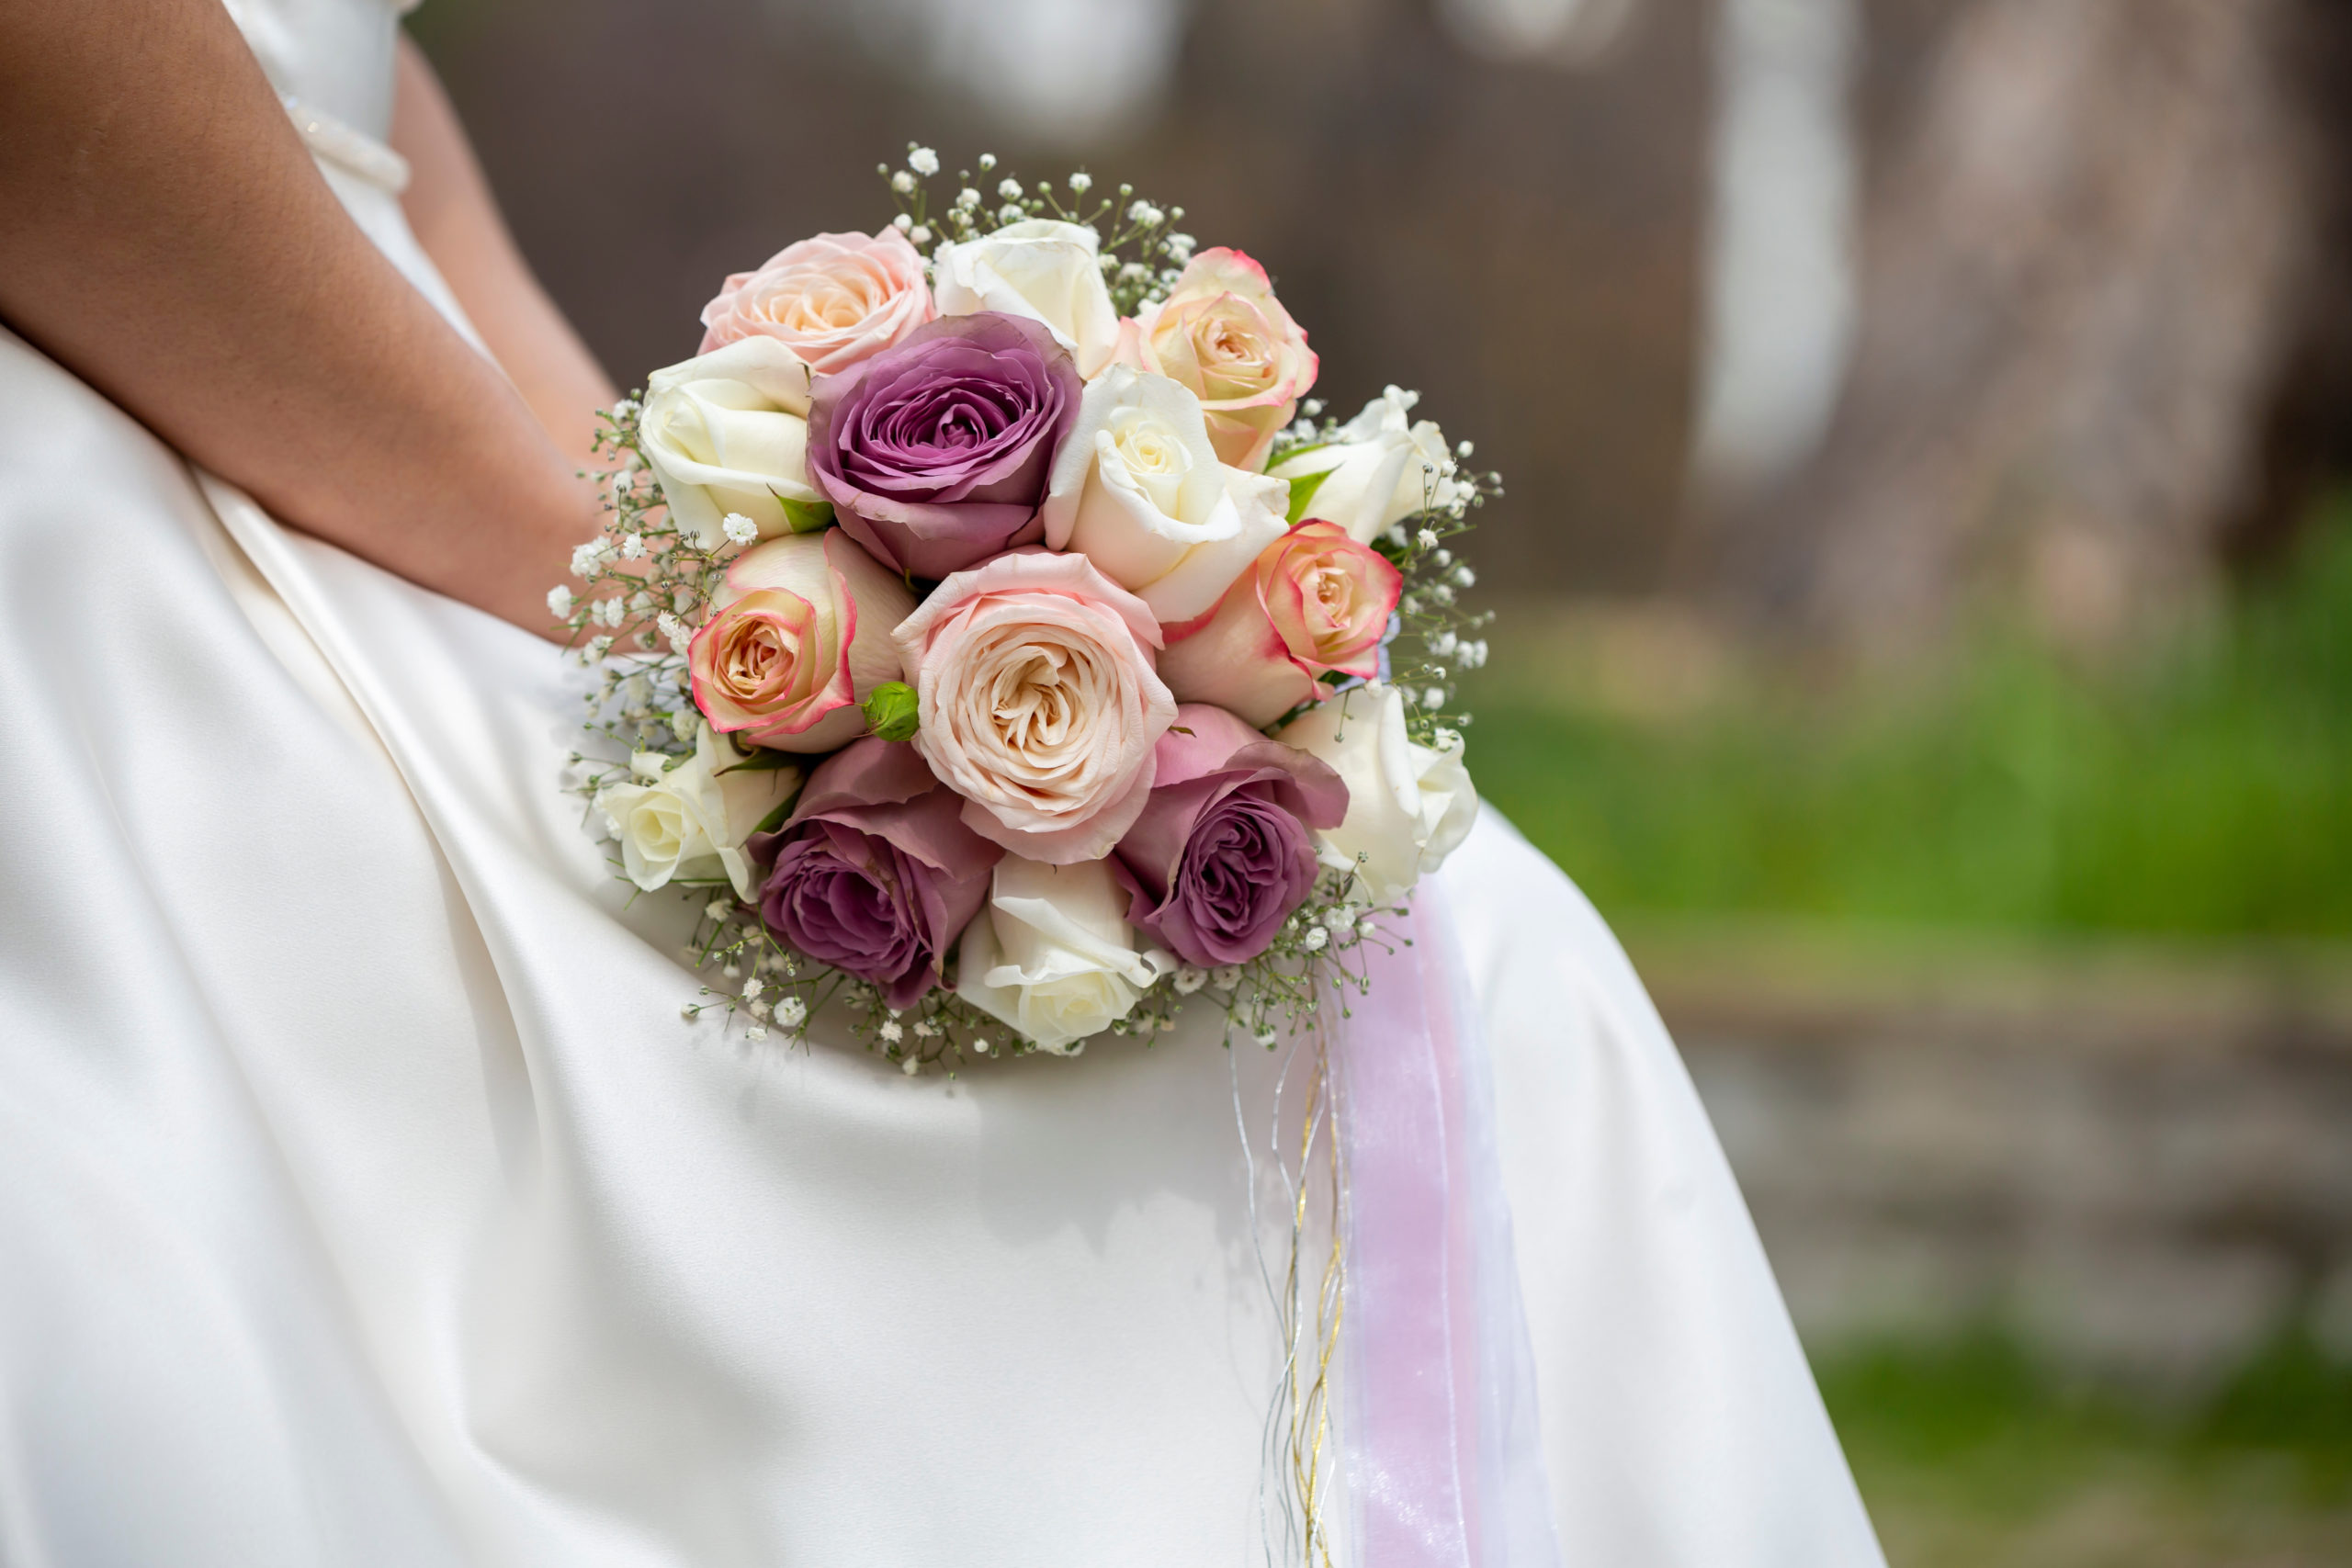 bride-holding-flowers-park-1470598679